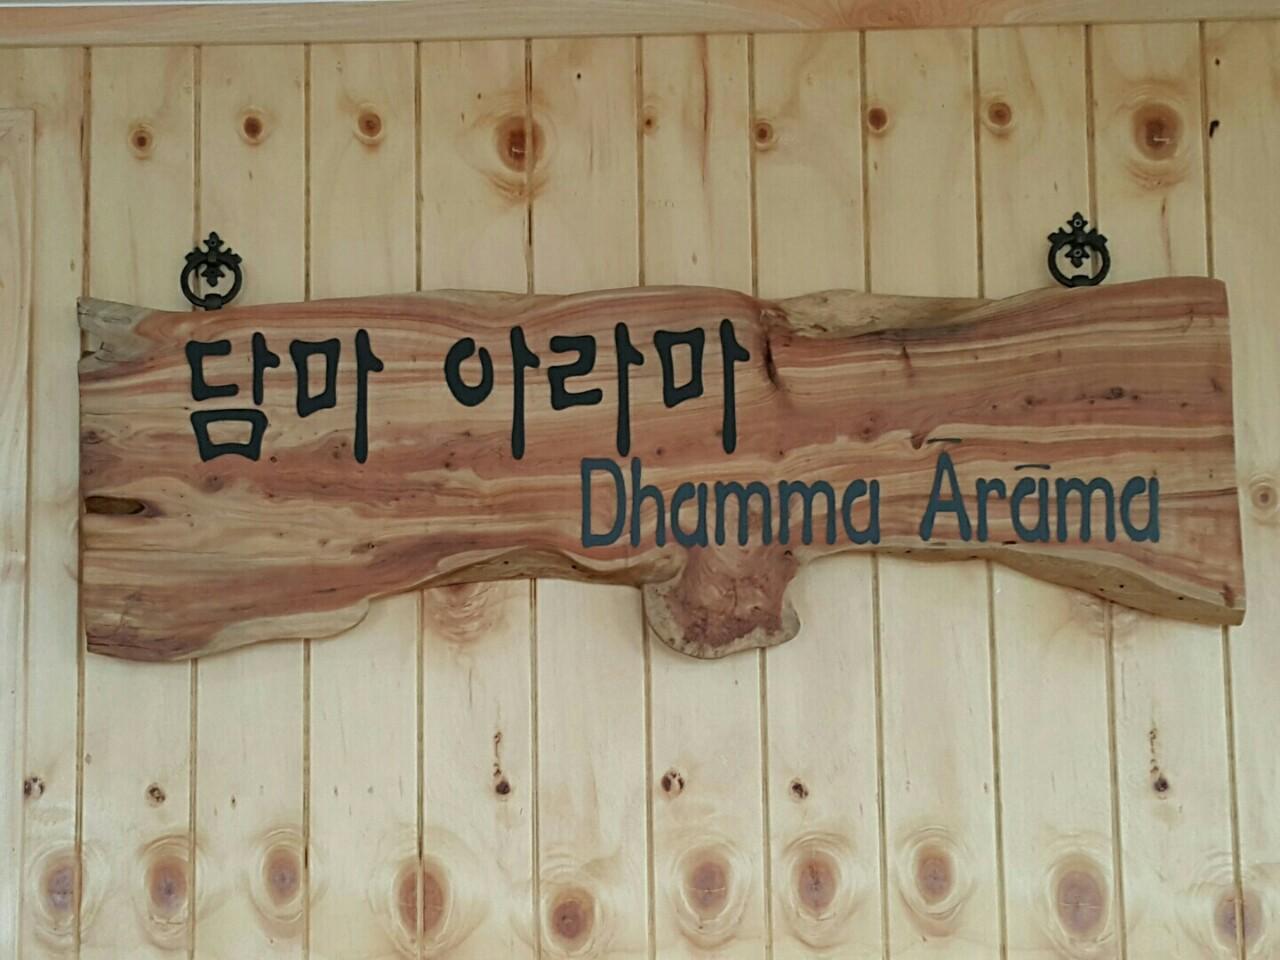 Dhamma Arama